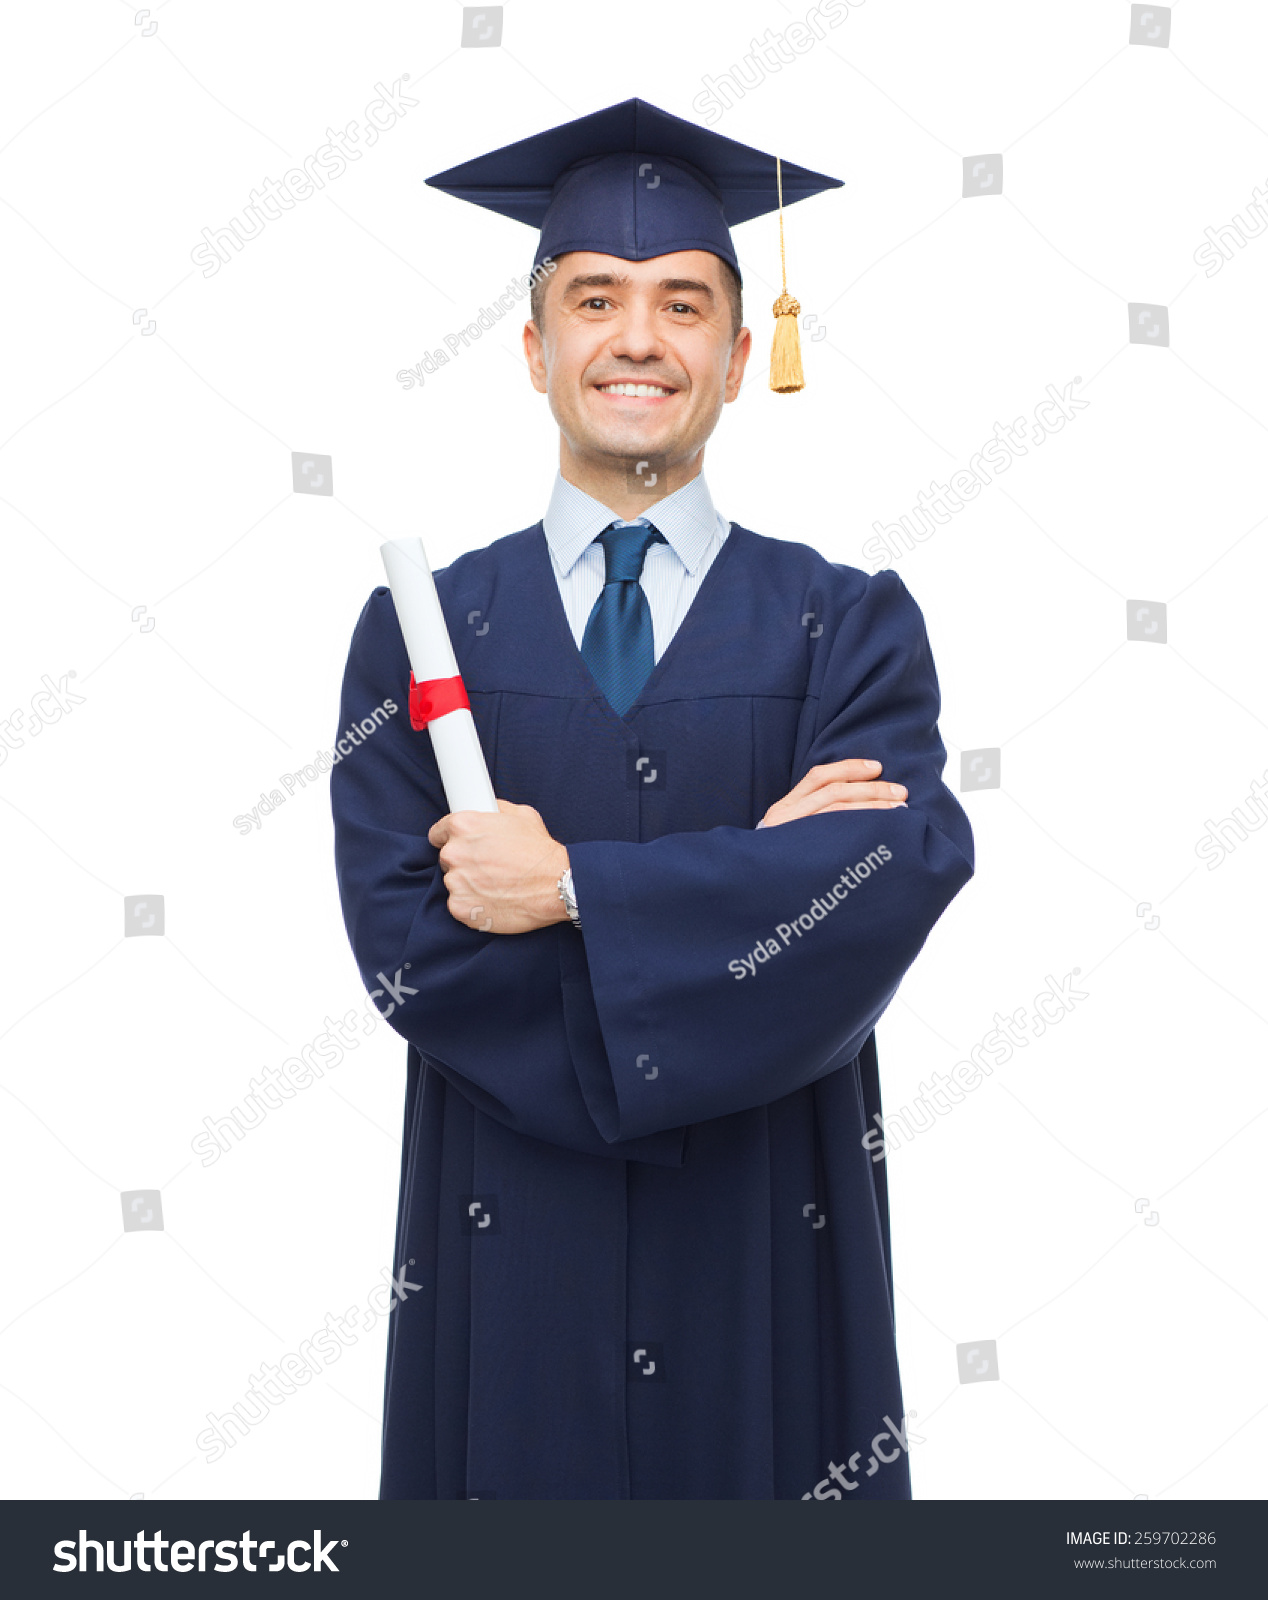 education graduation people concept smiling adult stock photo  education graduation and people concept smiling adult student in mortarboard diploma